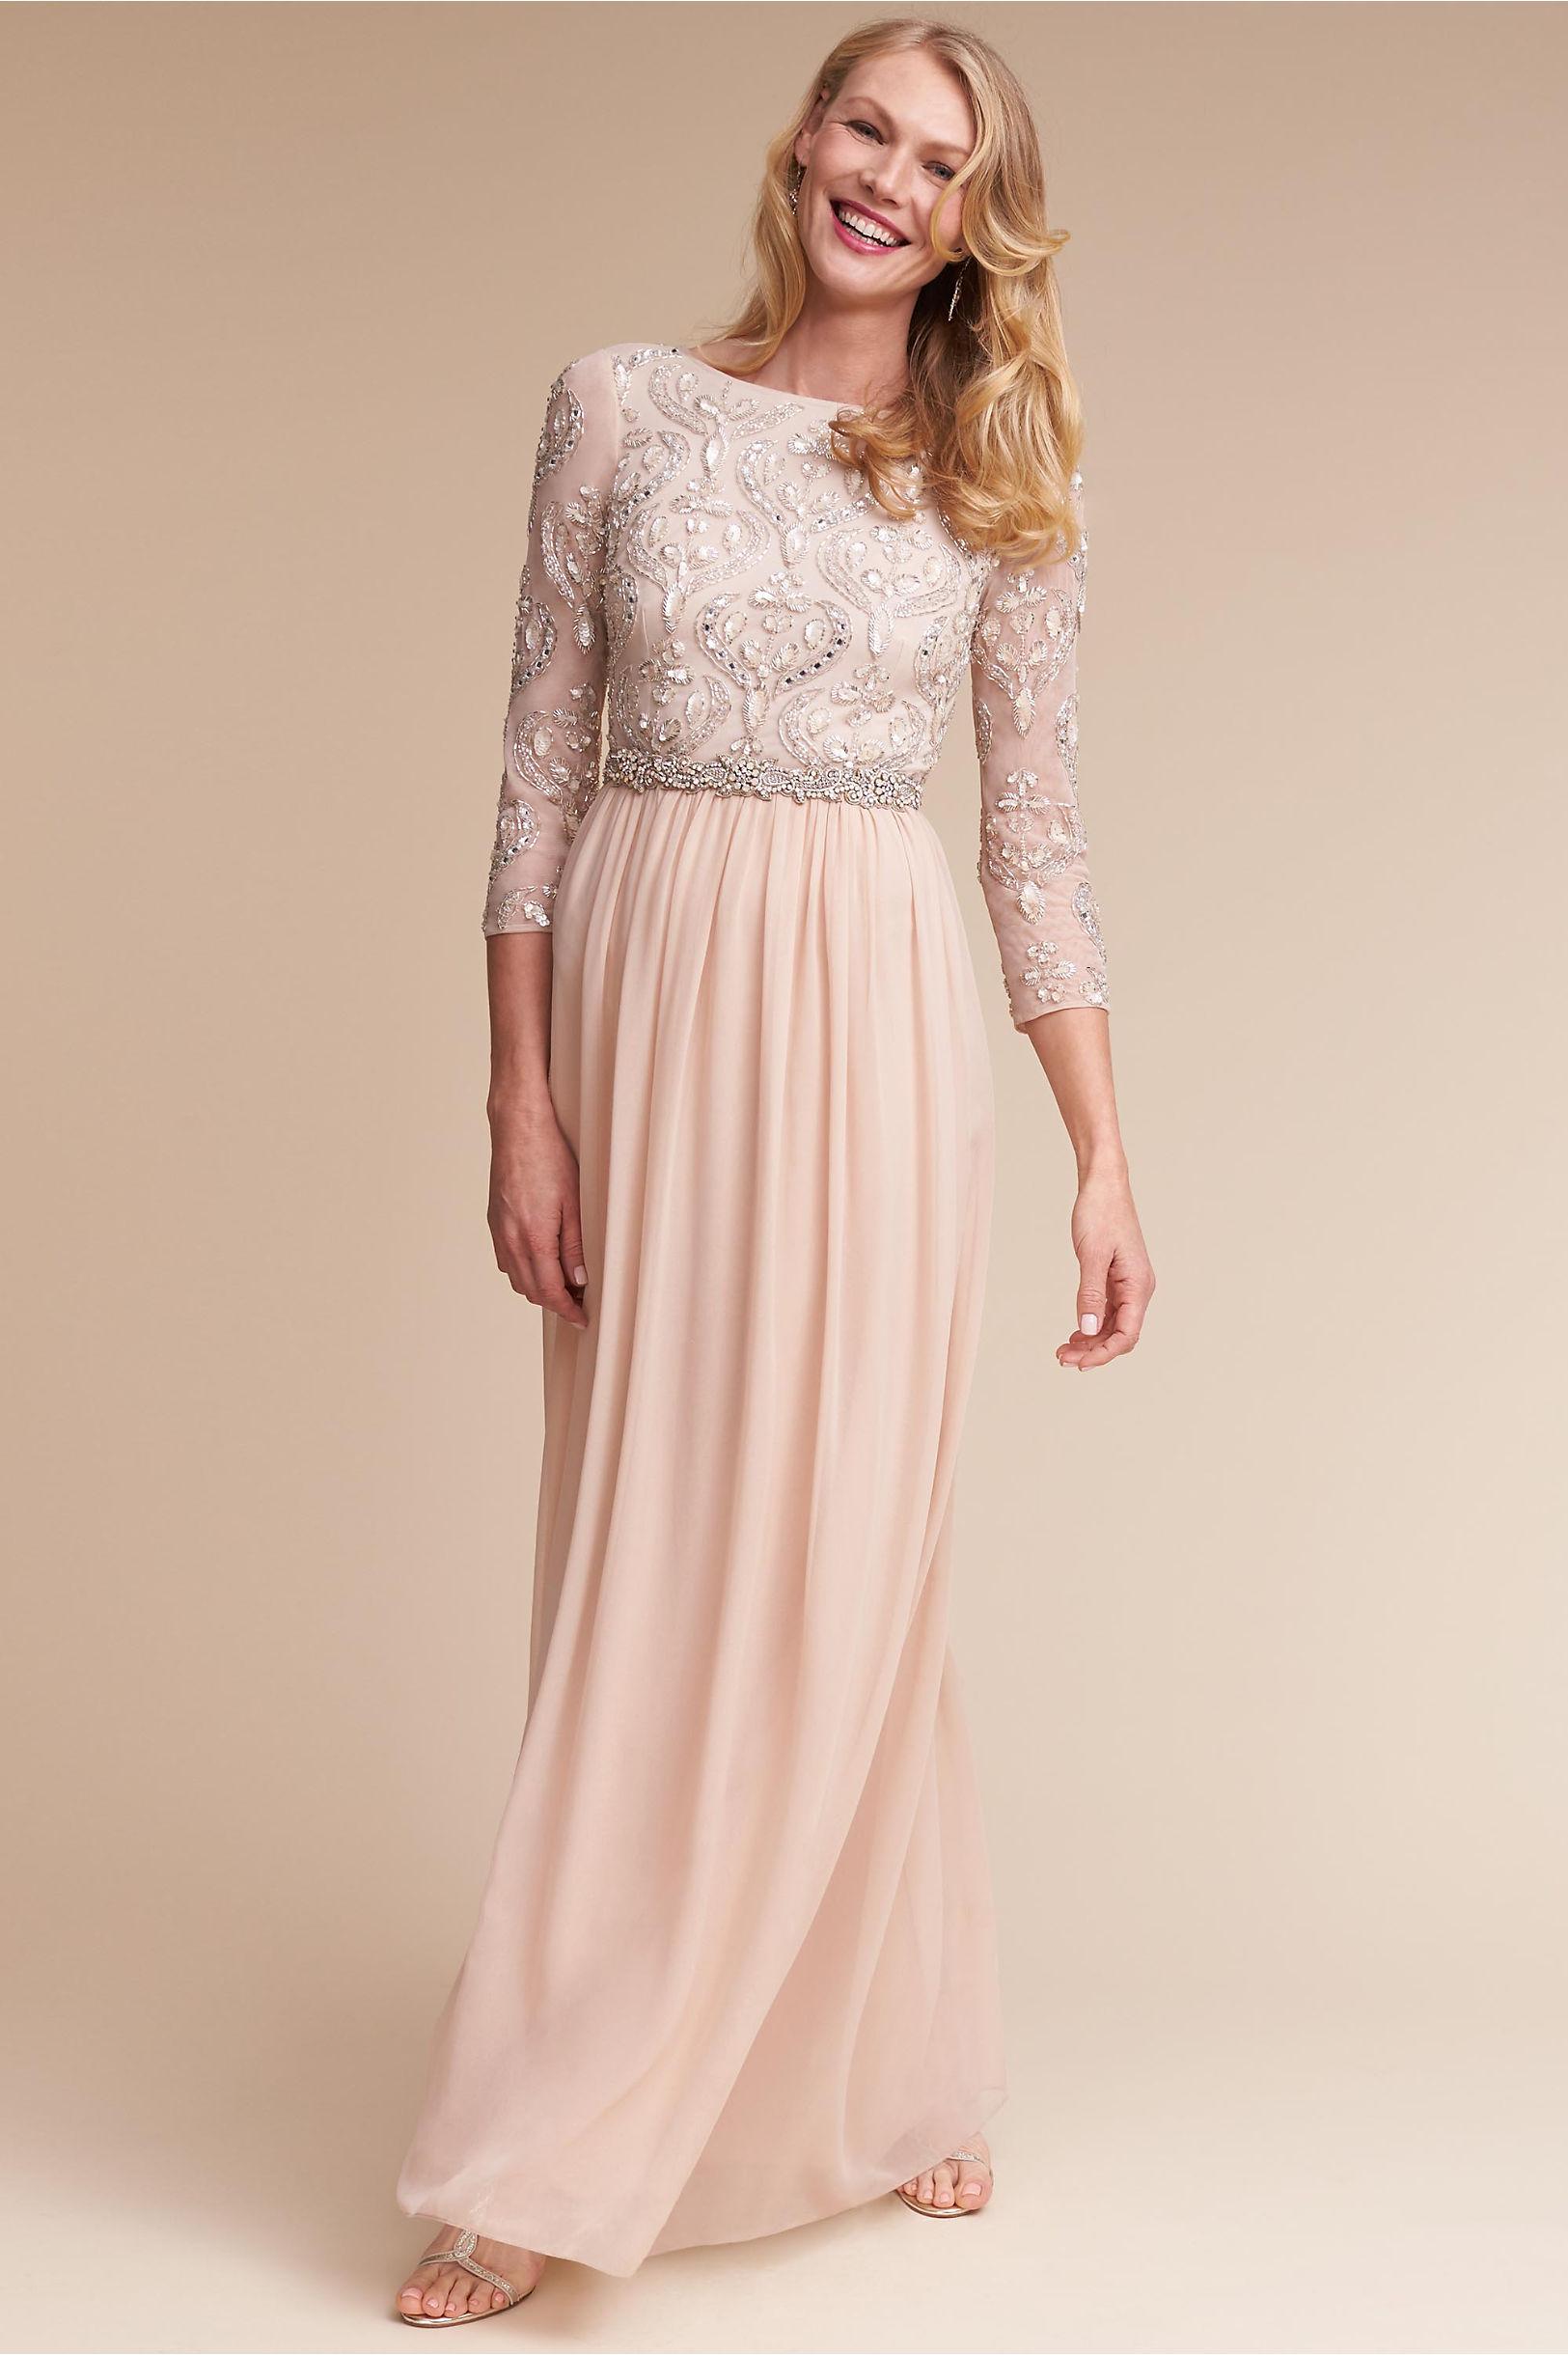 Giada Dress in Sale | BHLDN